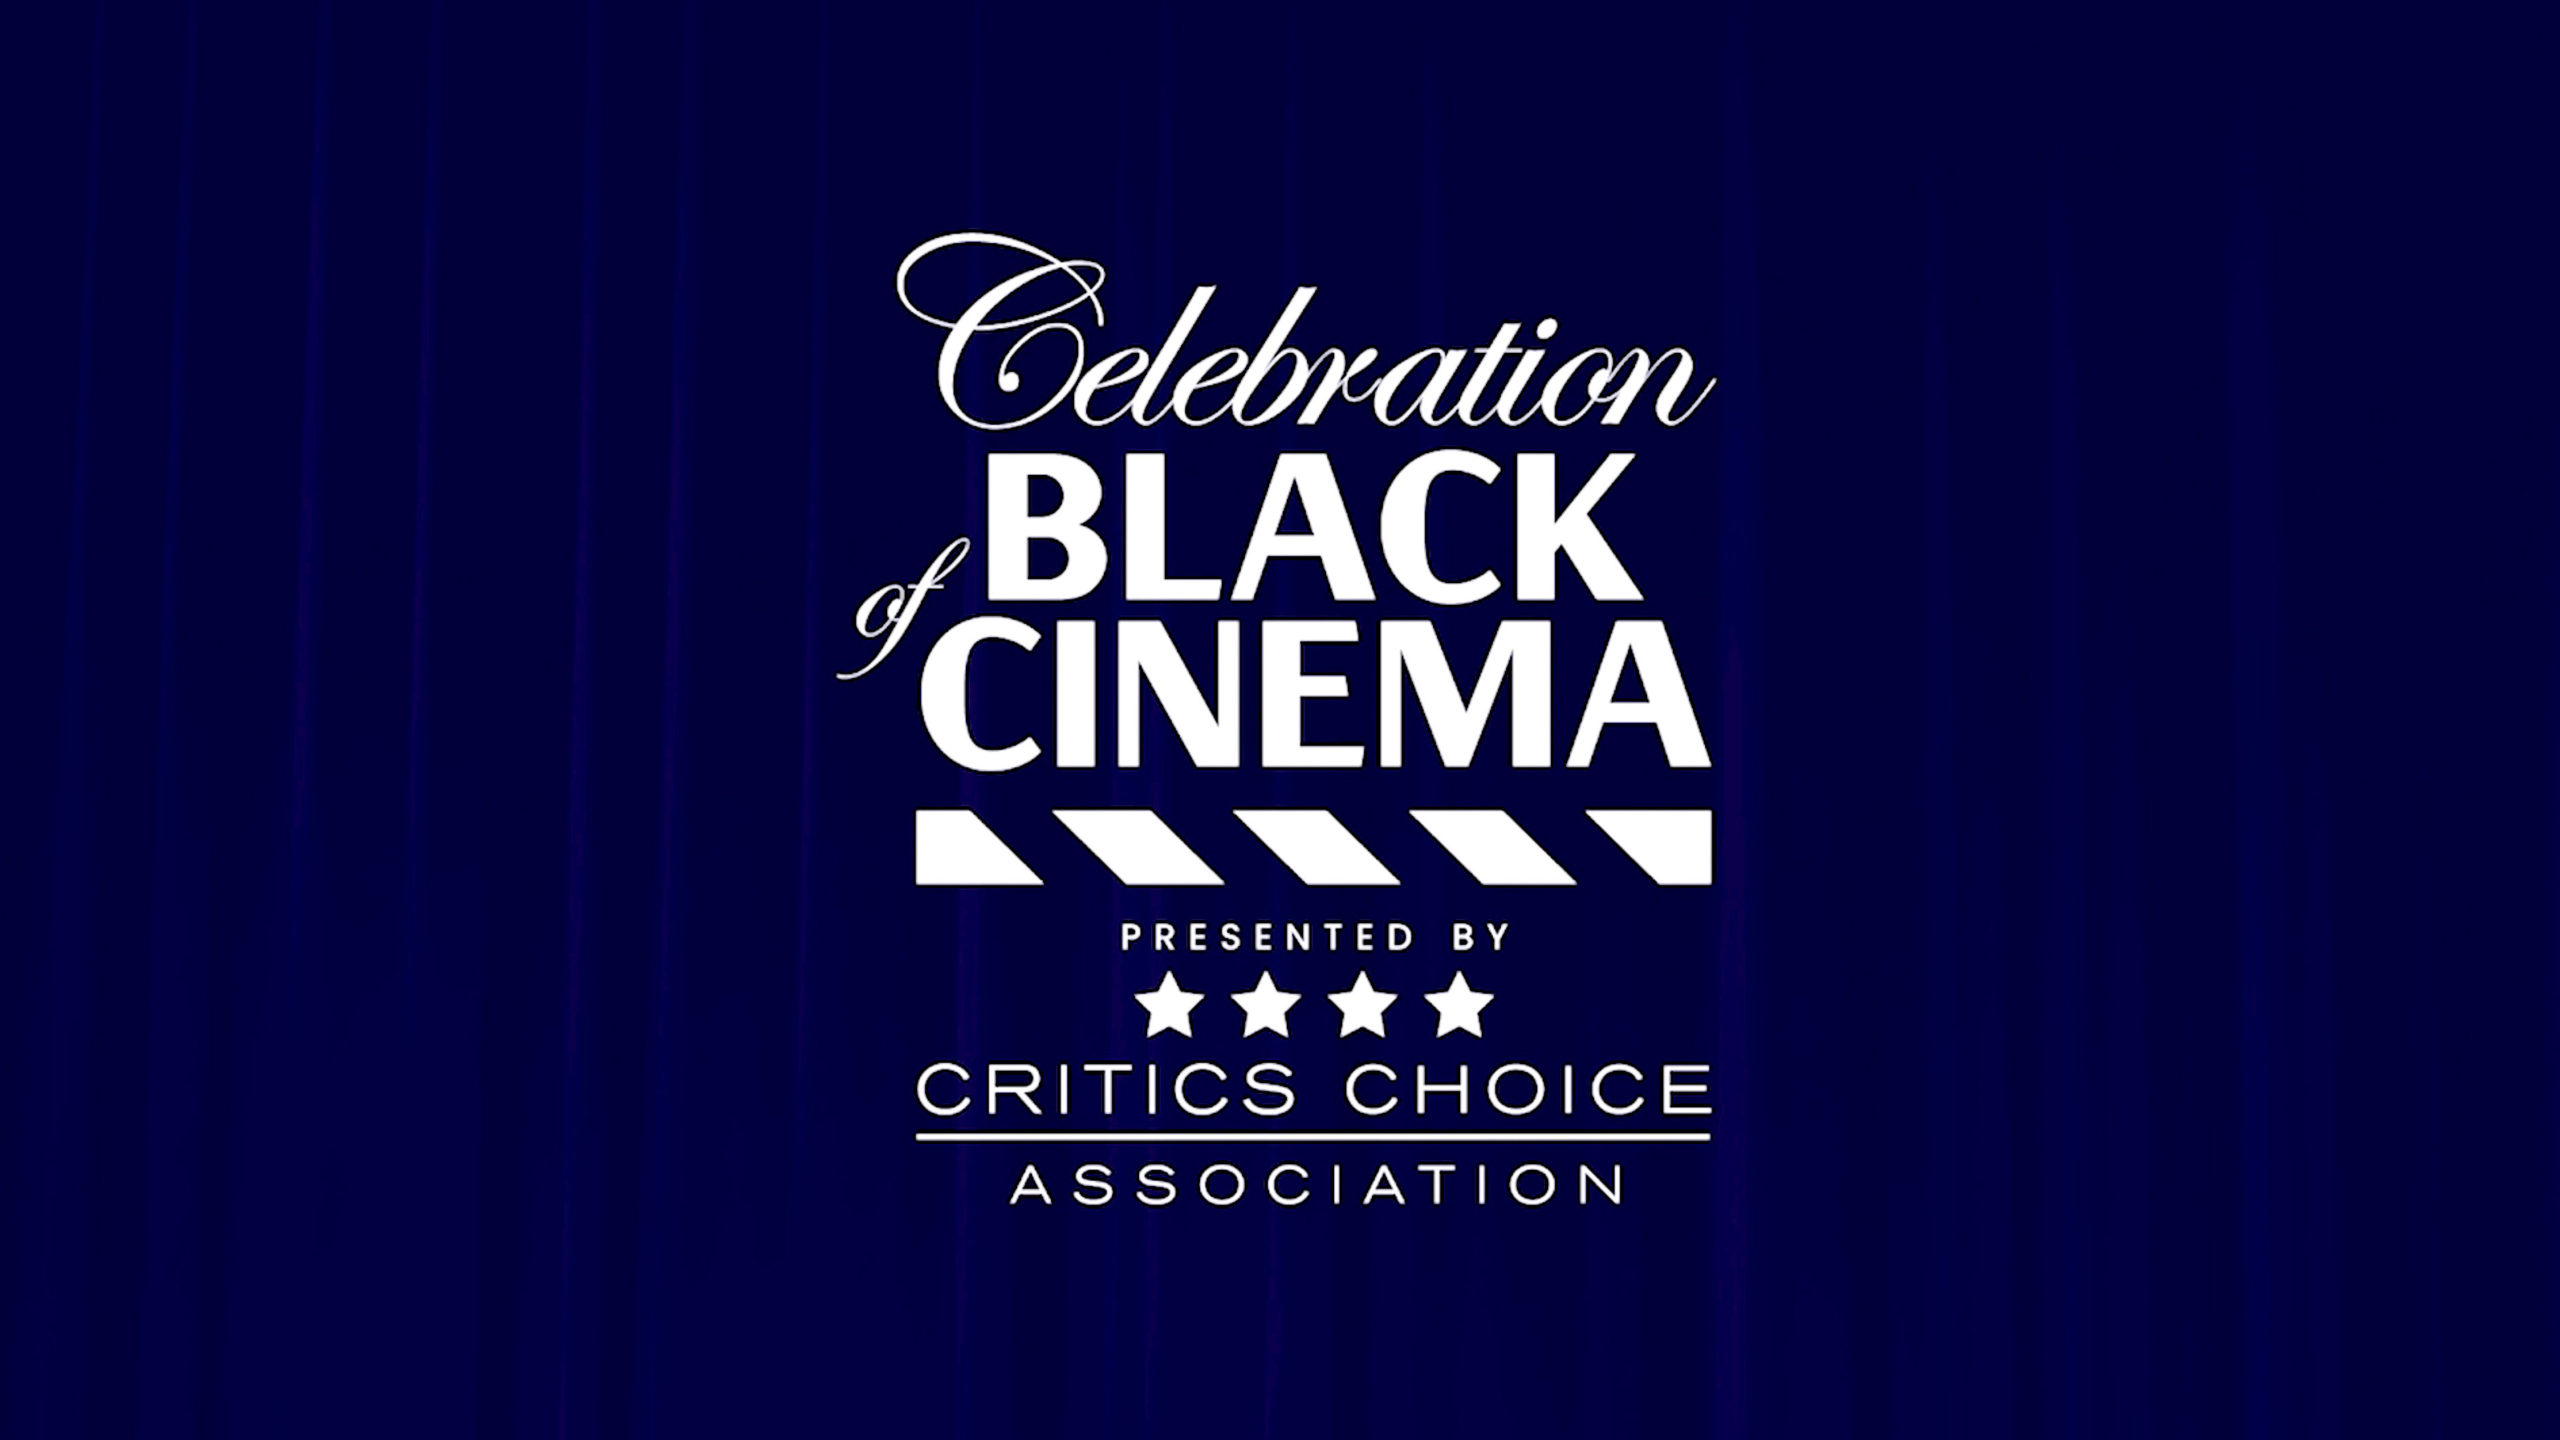 Celebration of Black Cinema: Late Breaking News